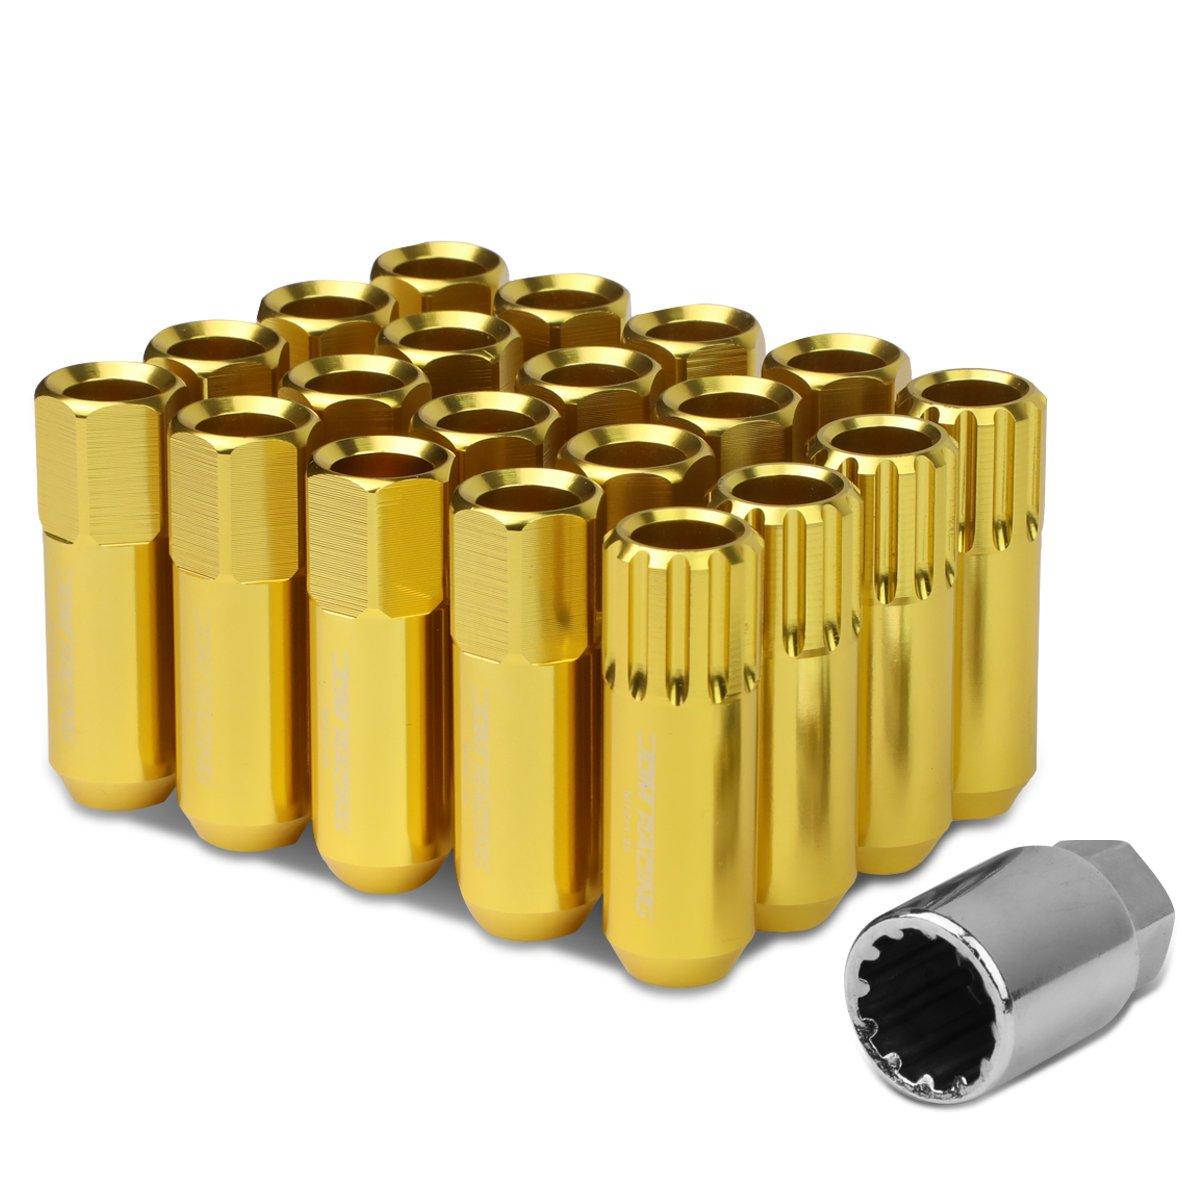 M12 x 1.25 Open End Design 16-Piece Aluminum Alloy Wheel Lug Nuts + 4 x Lock Nut + 1 x Lock Nut Key (Gold)